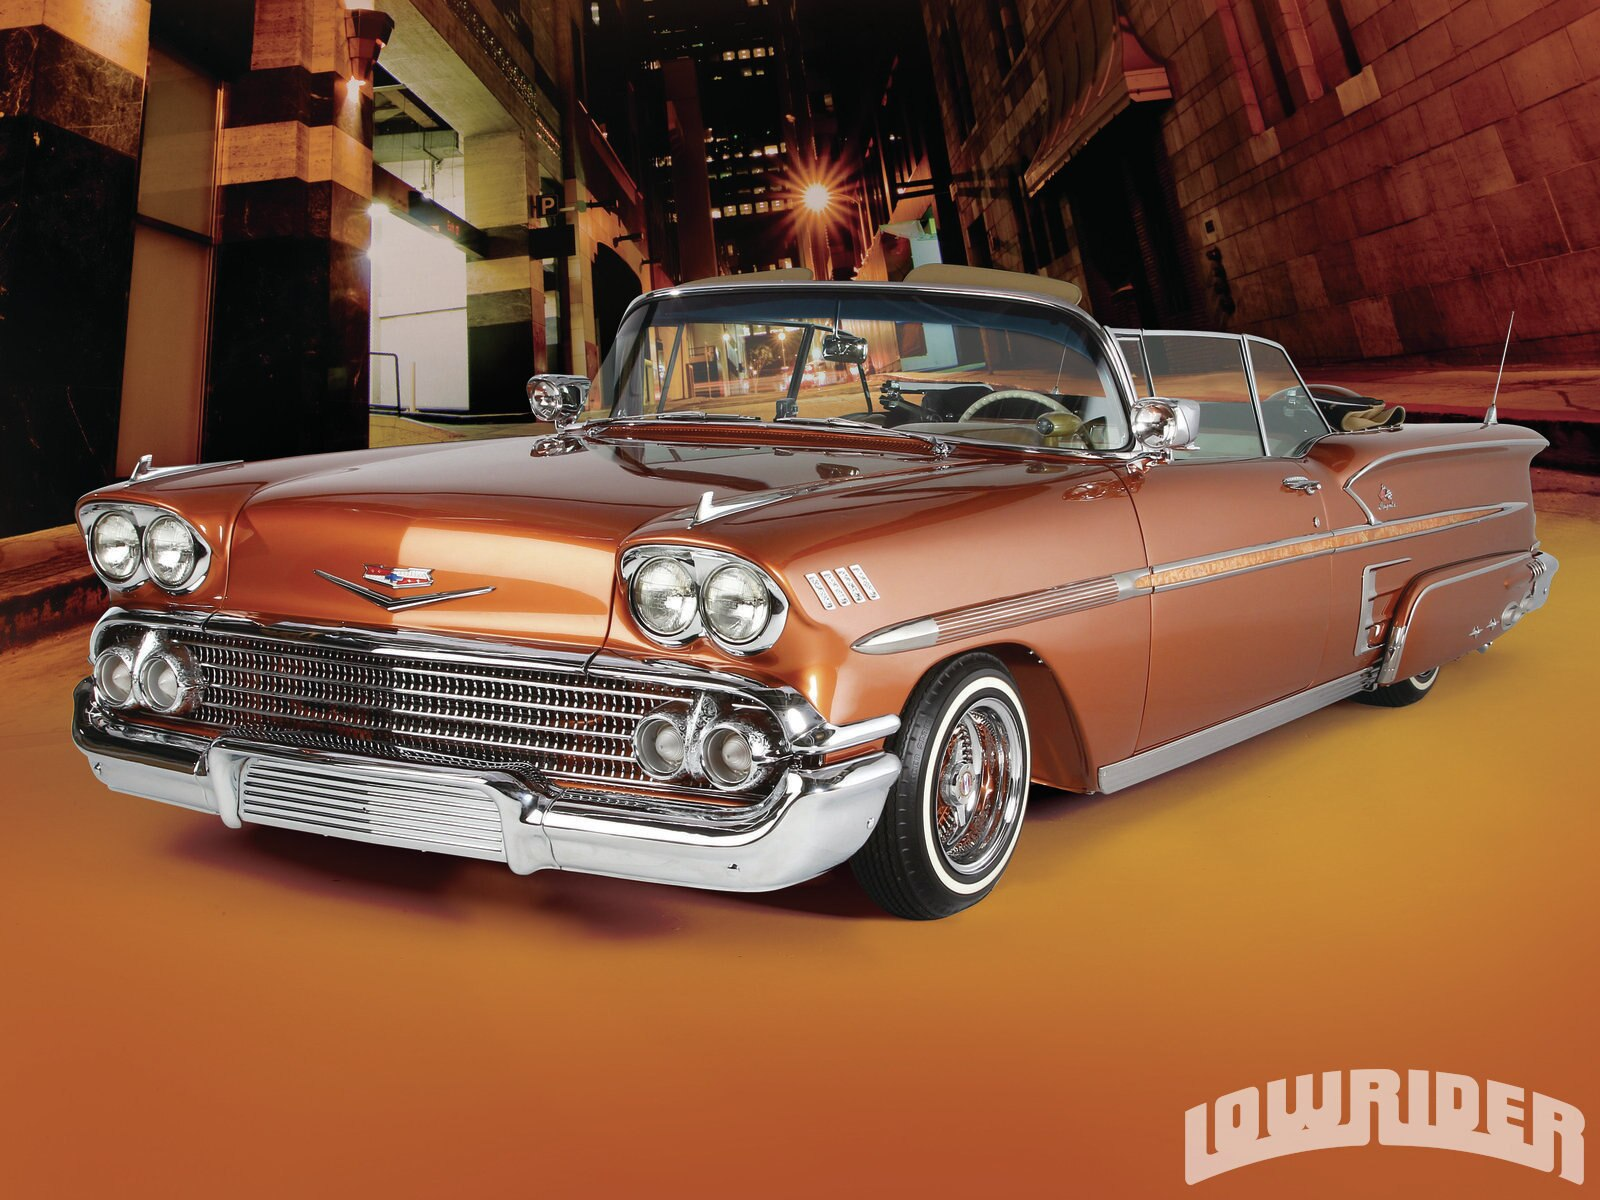 lrmp-1111-01-o-1958-impala-convertible-front4